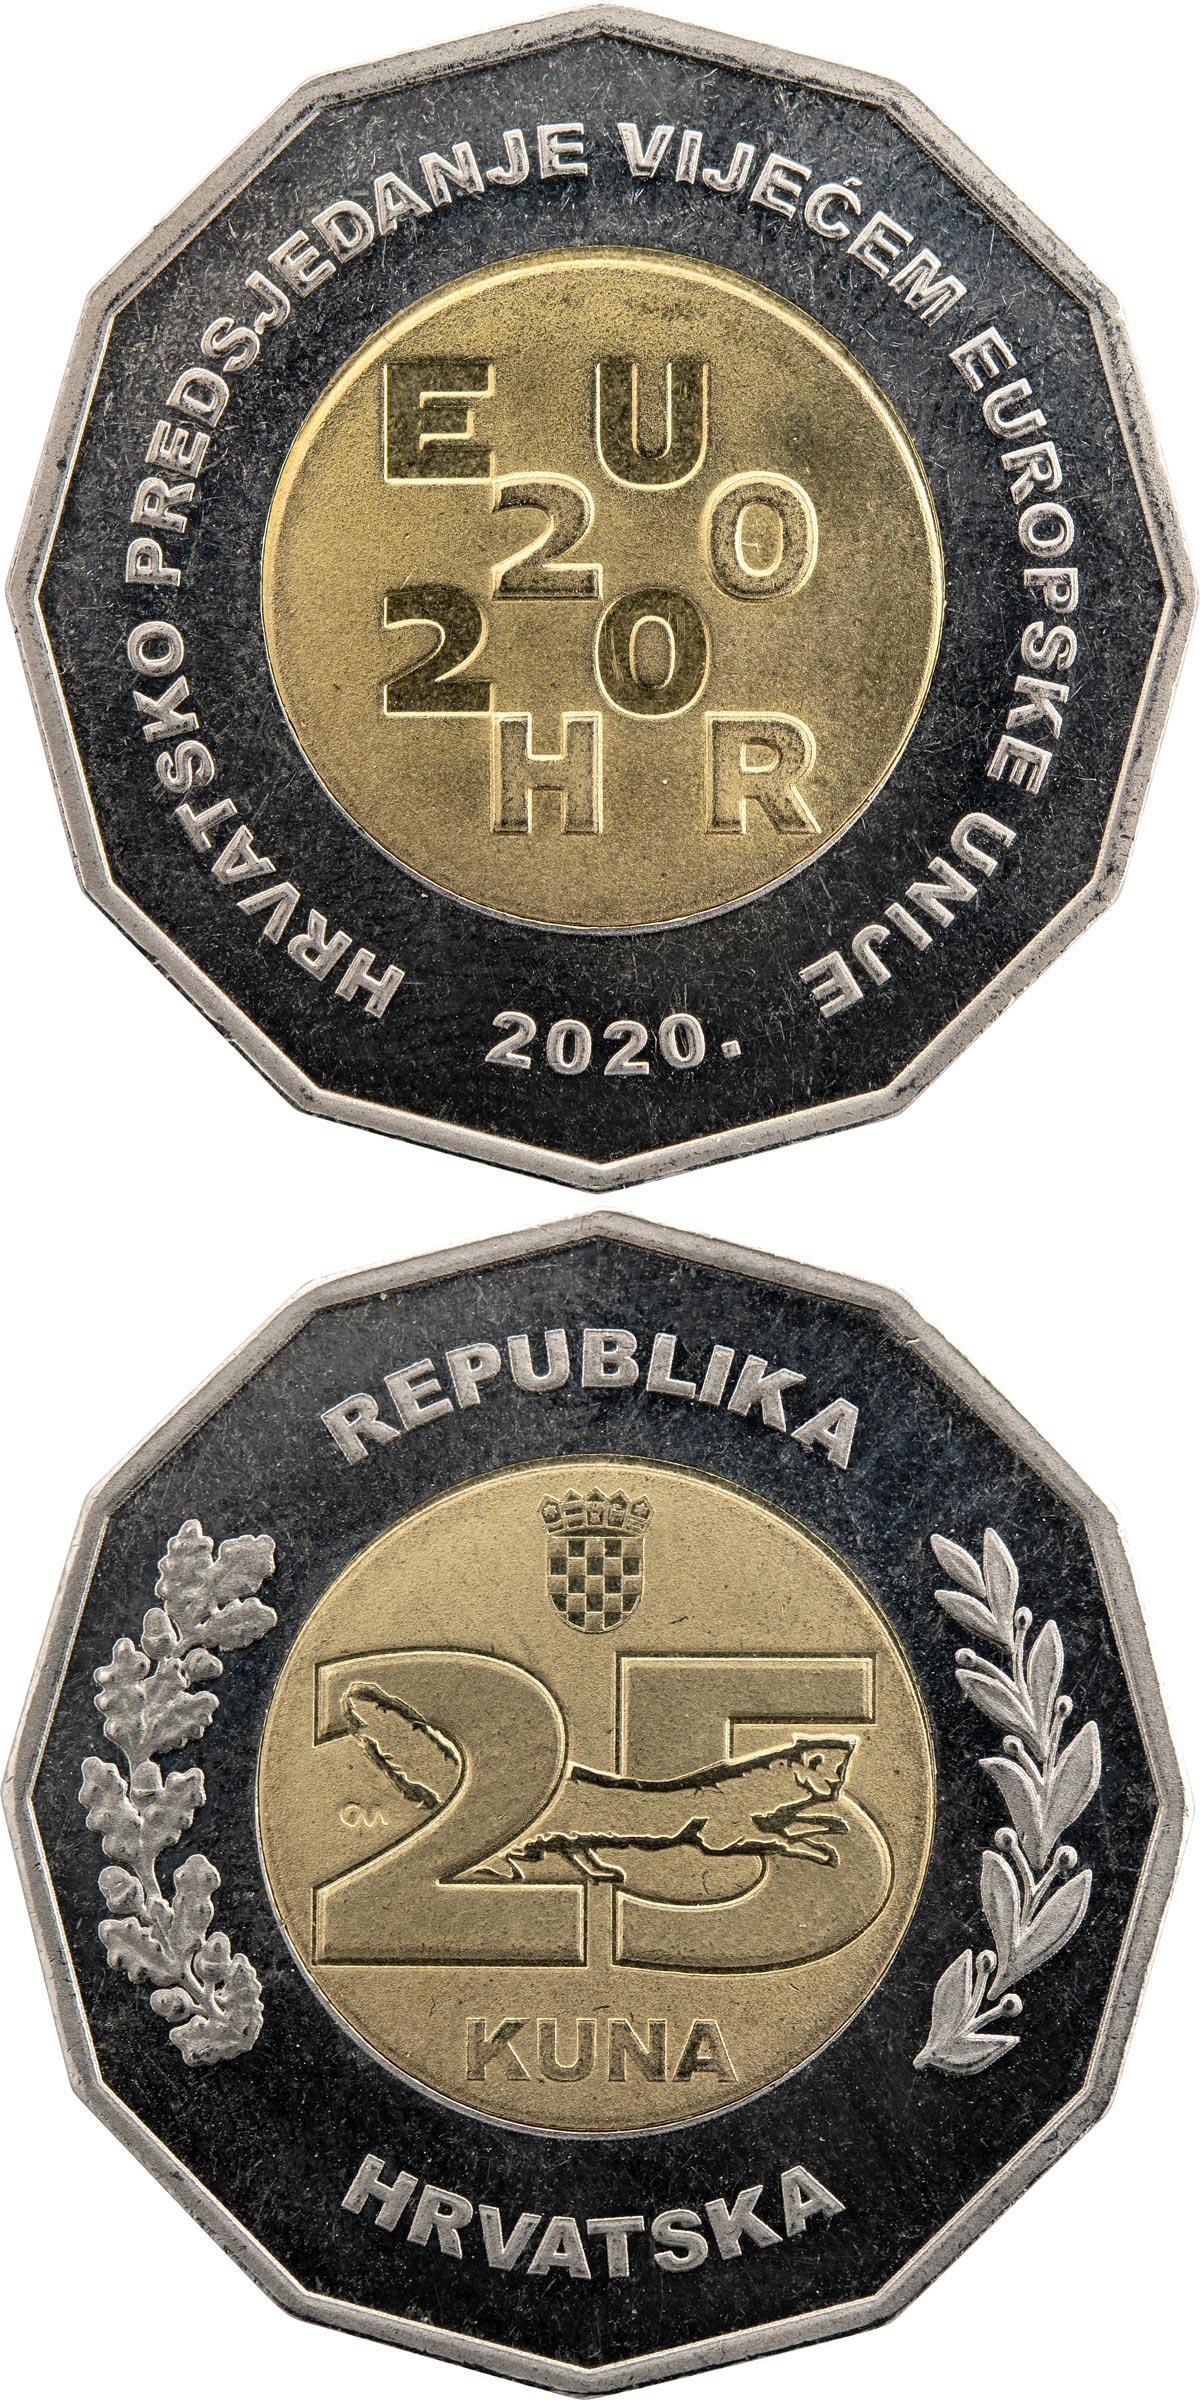 Croatia 25 Kuna 2002 Bi-metallic International Recognition of Croatia